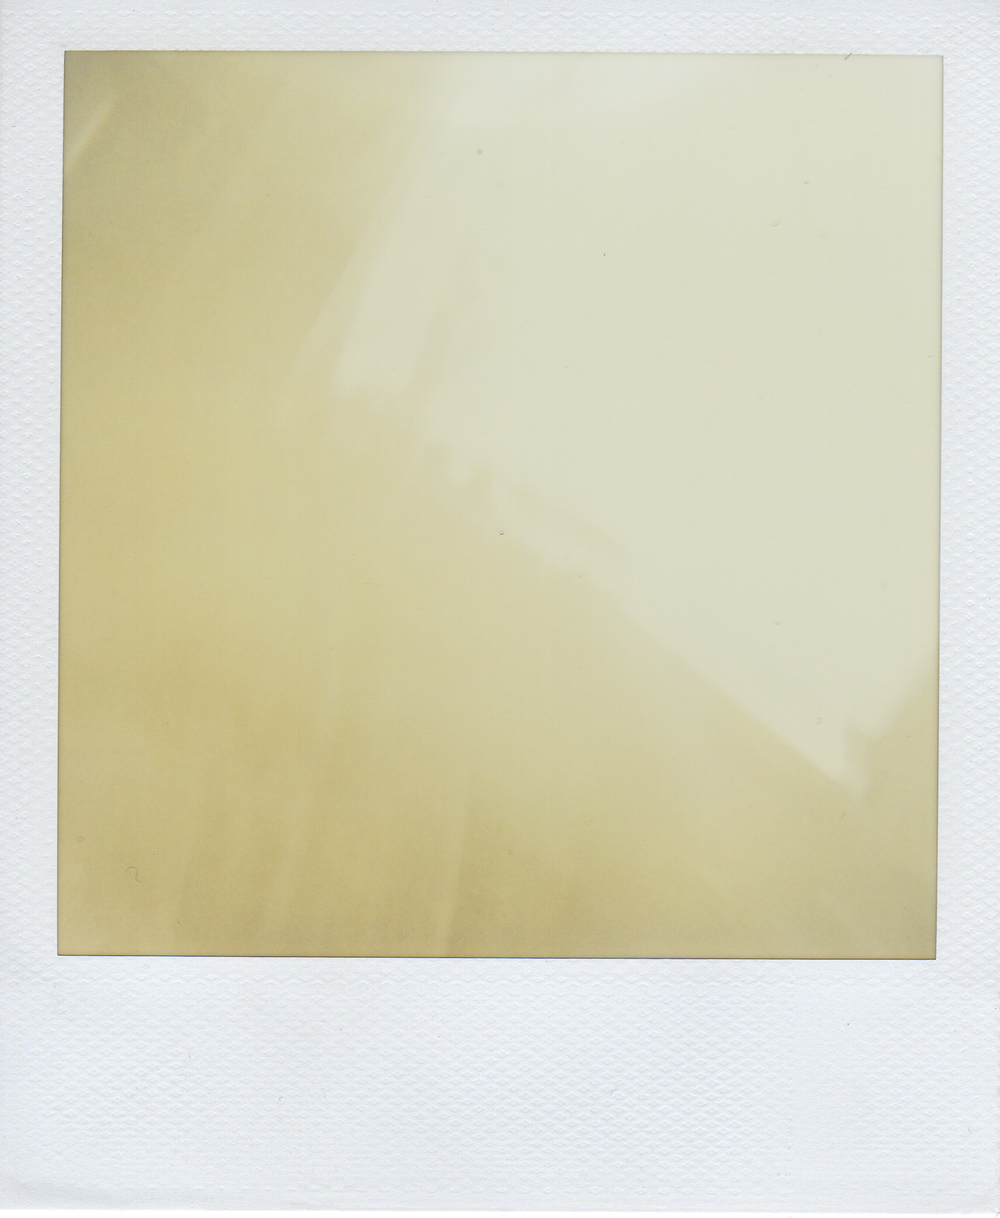 jlaurence-polaroid-139.jpg